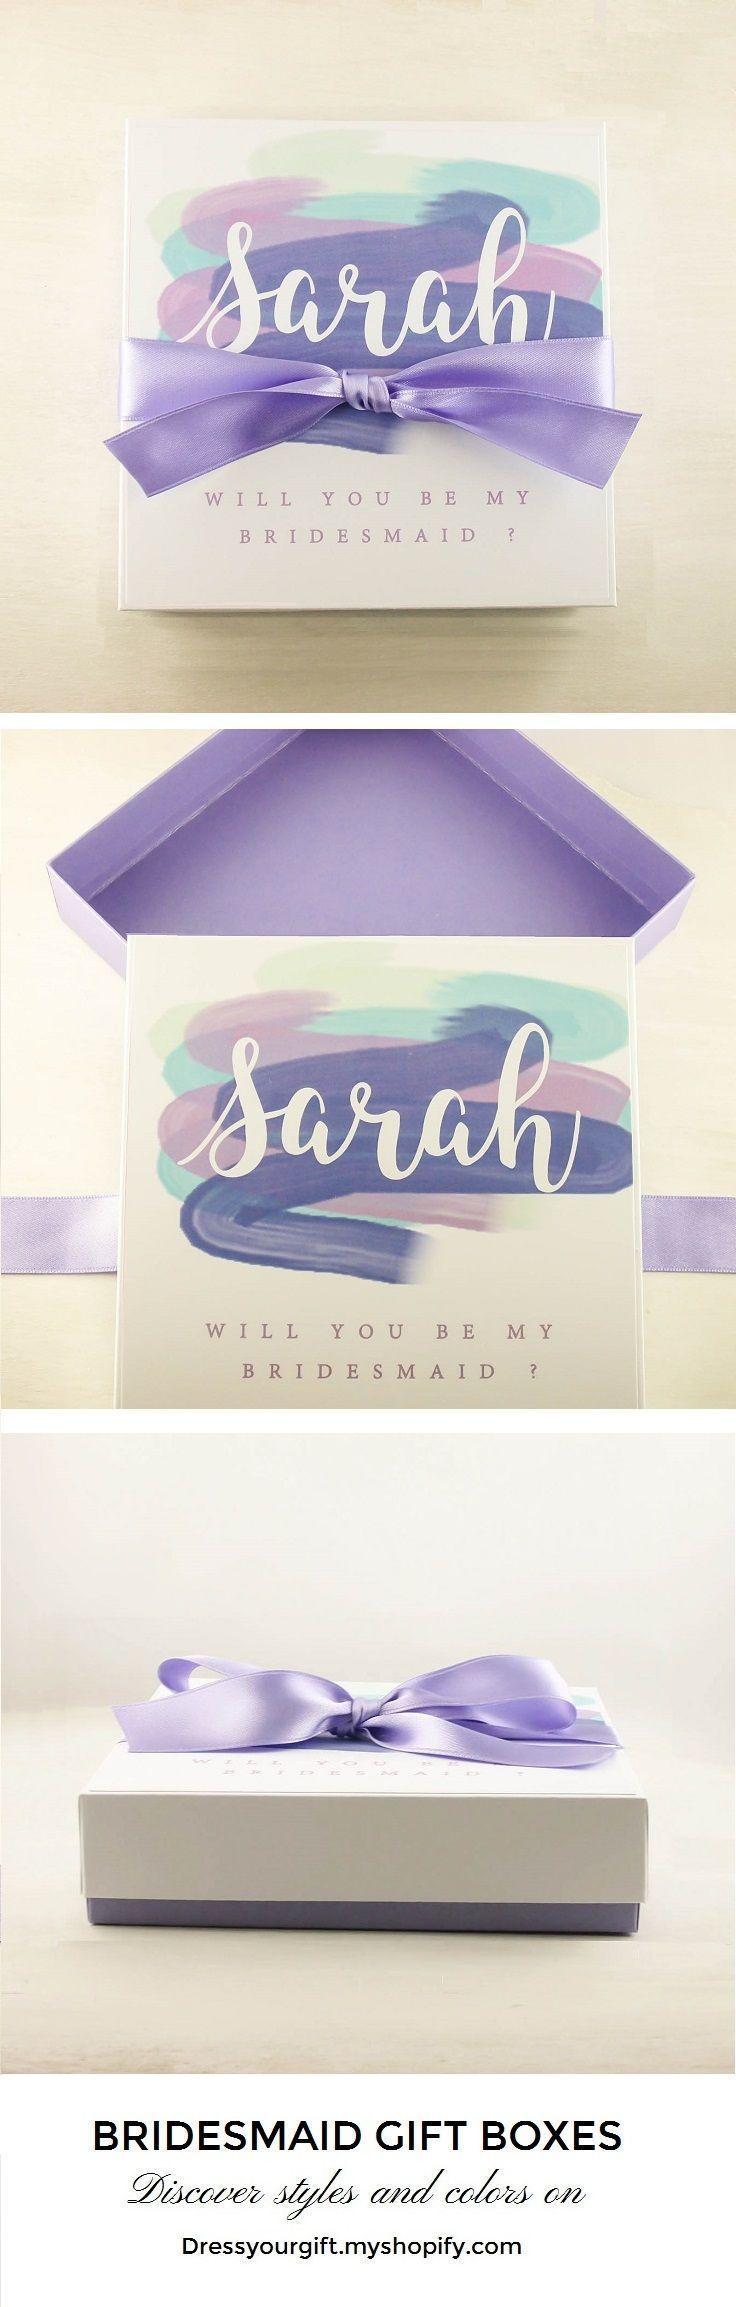 Purple satin ribbon decorated bridesmaid gift box with lid Dama de Honor quieres ser mi #demoiselledhonneur Trauzeugin Geschenk #brautjungfern